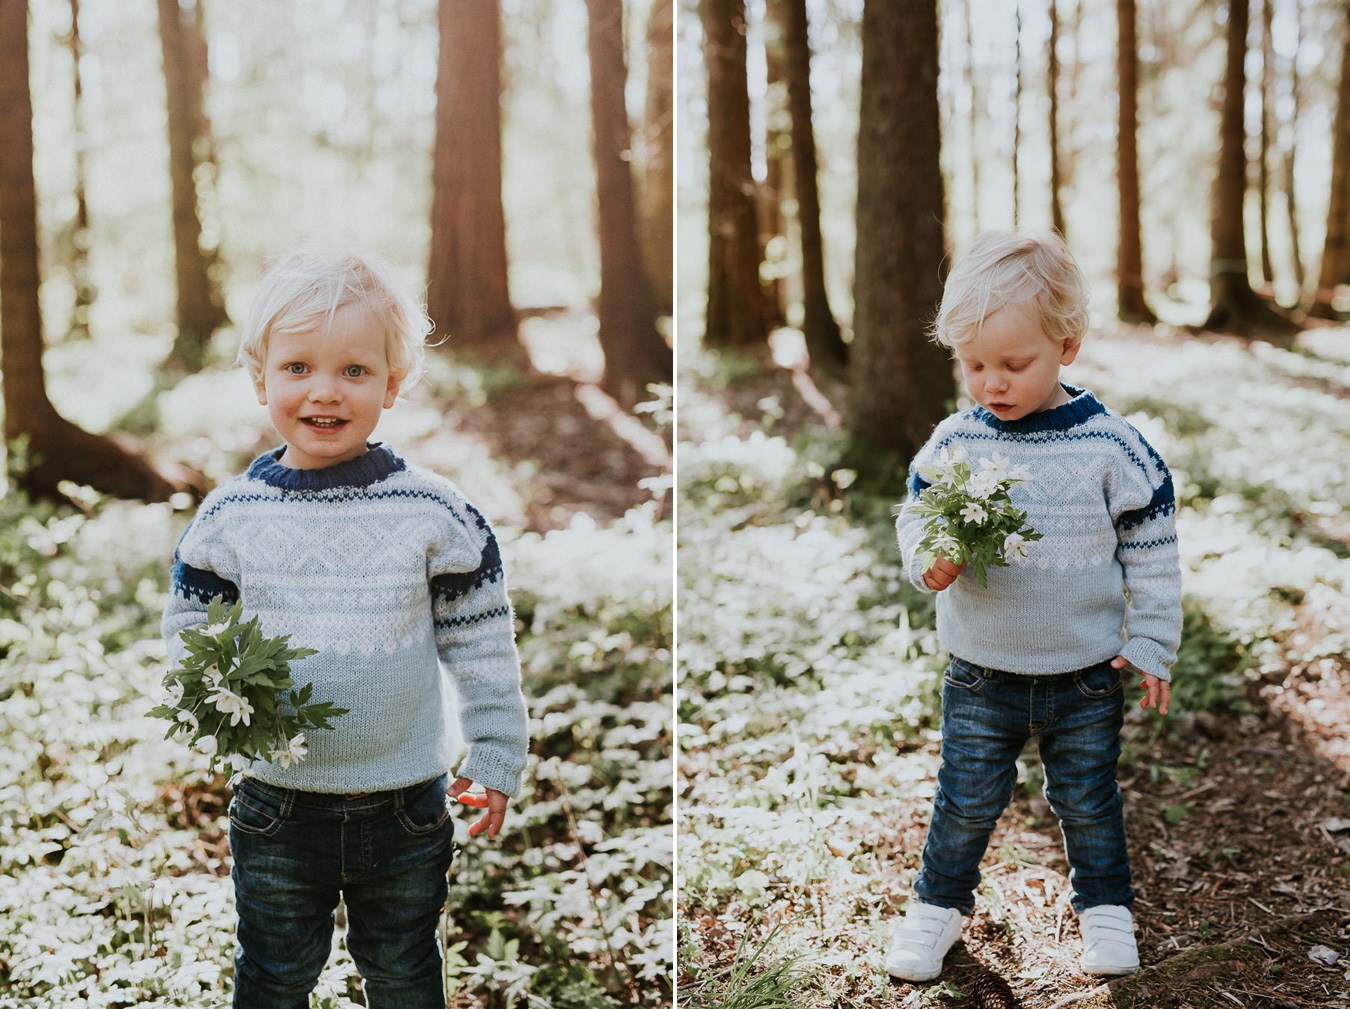 024-Fotograf-Tone-Tvedt-barnefotografering-oslo.jpg